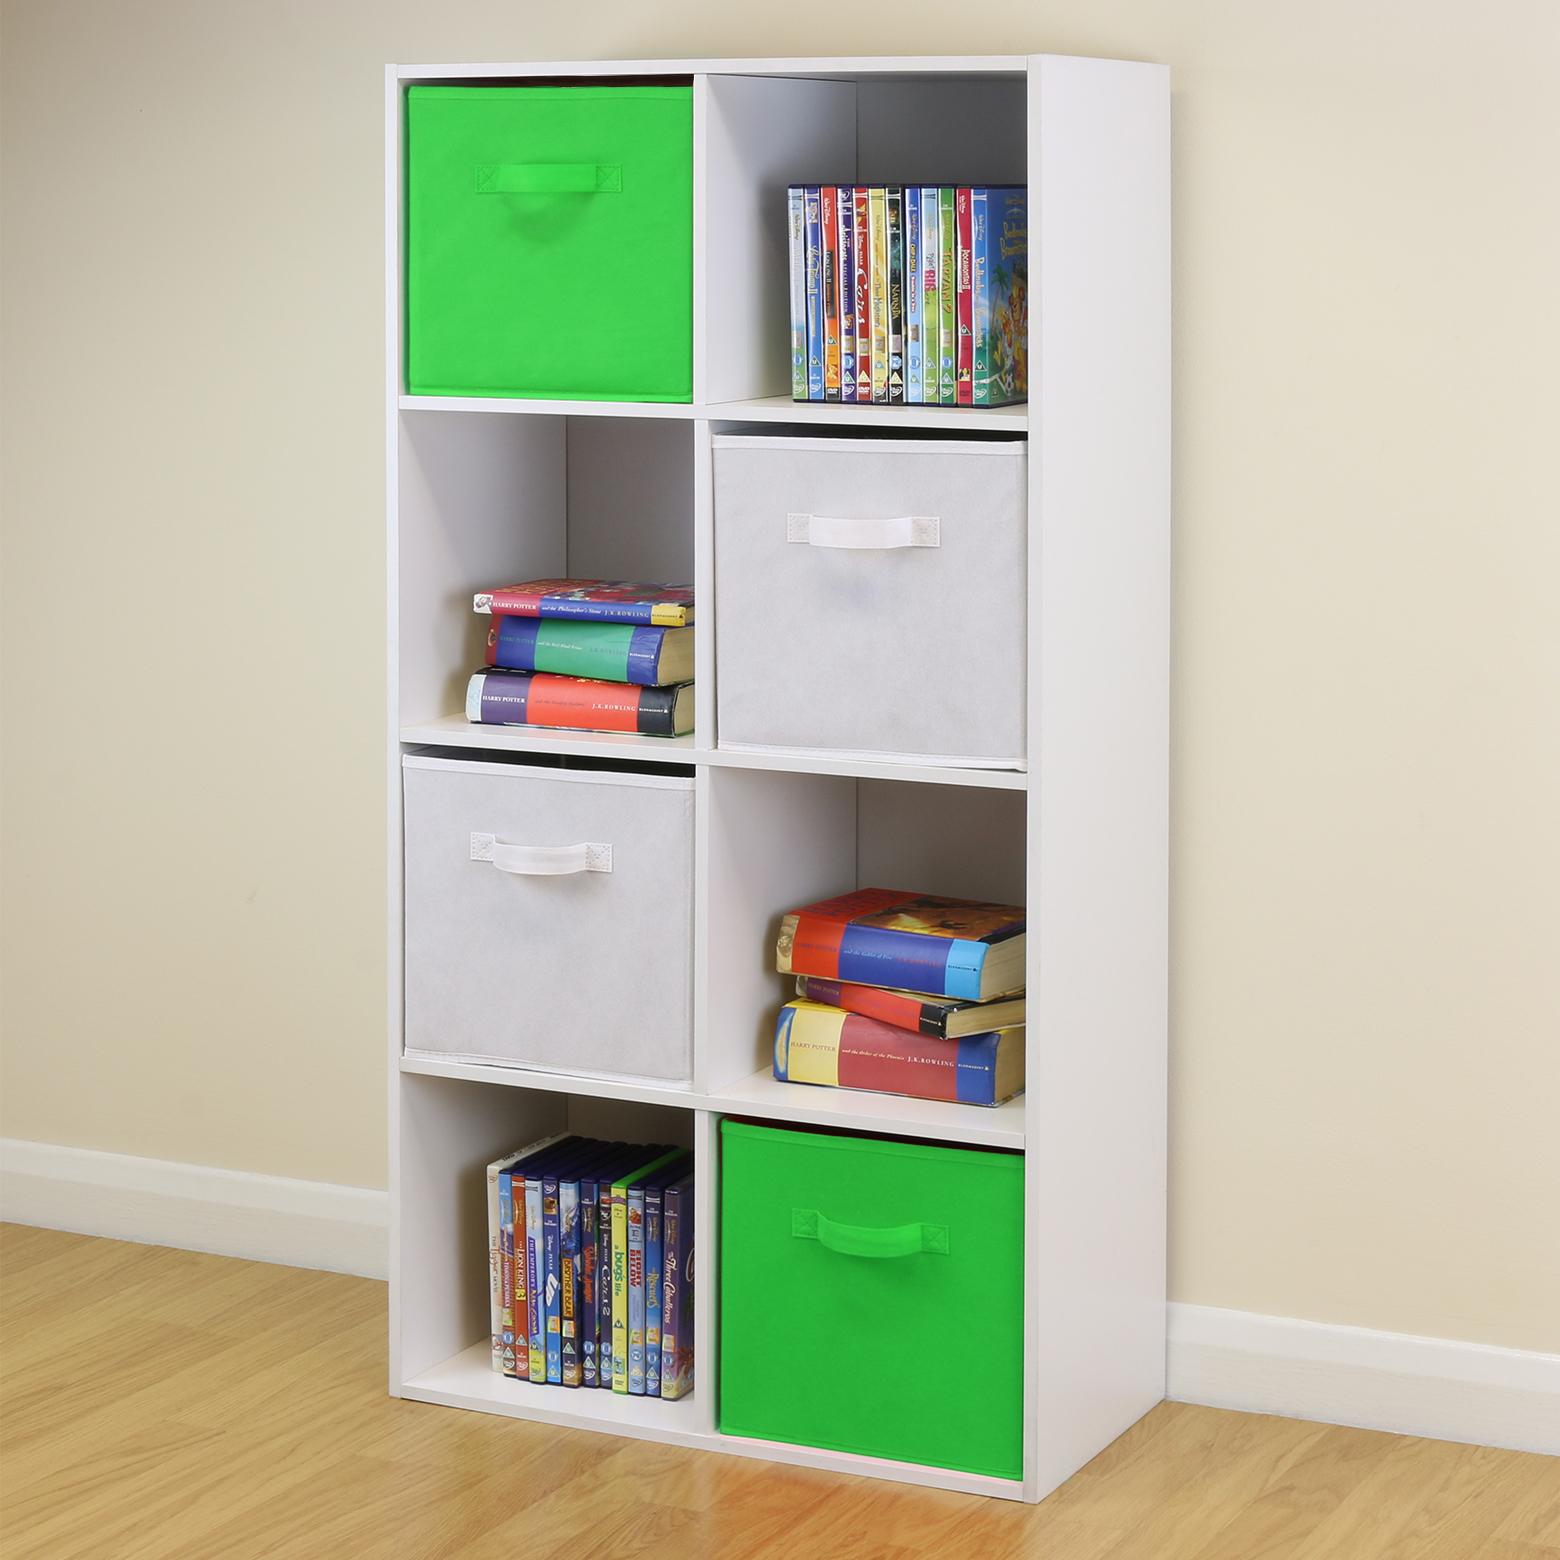 8 Cube Kids Green White Toy Games Storage Unit Girls Boys Bedroom Shelves Boxe Ebay